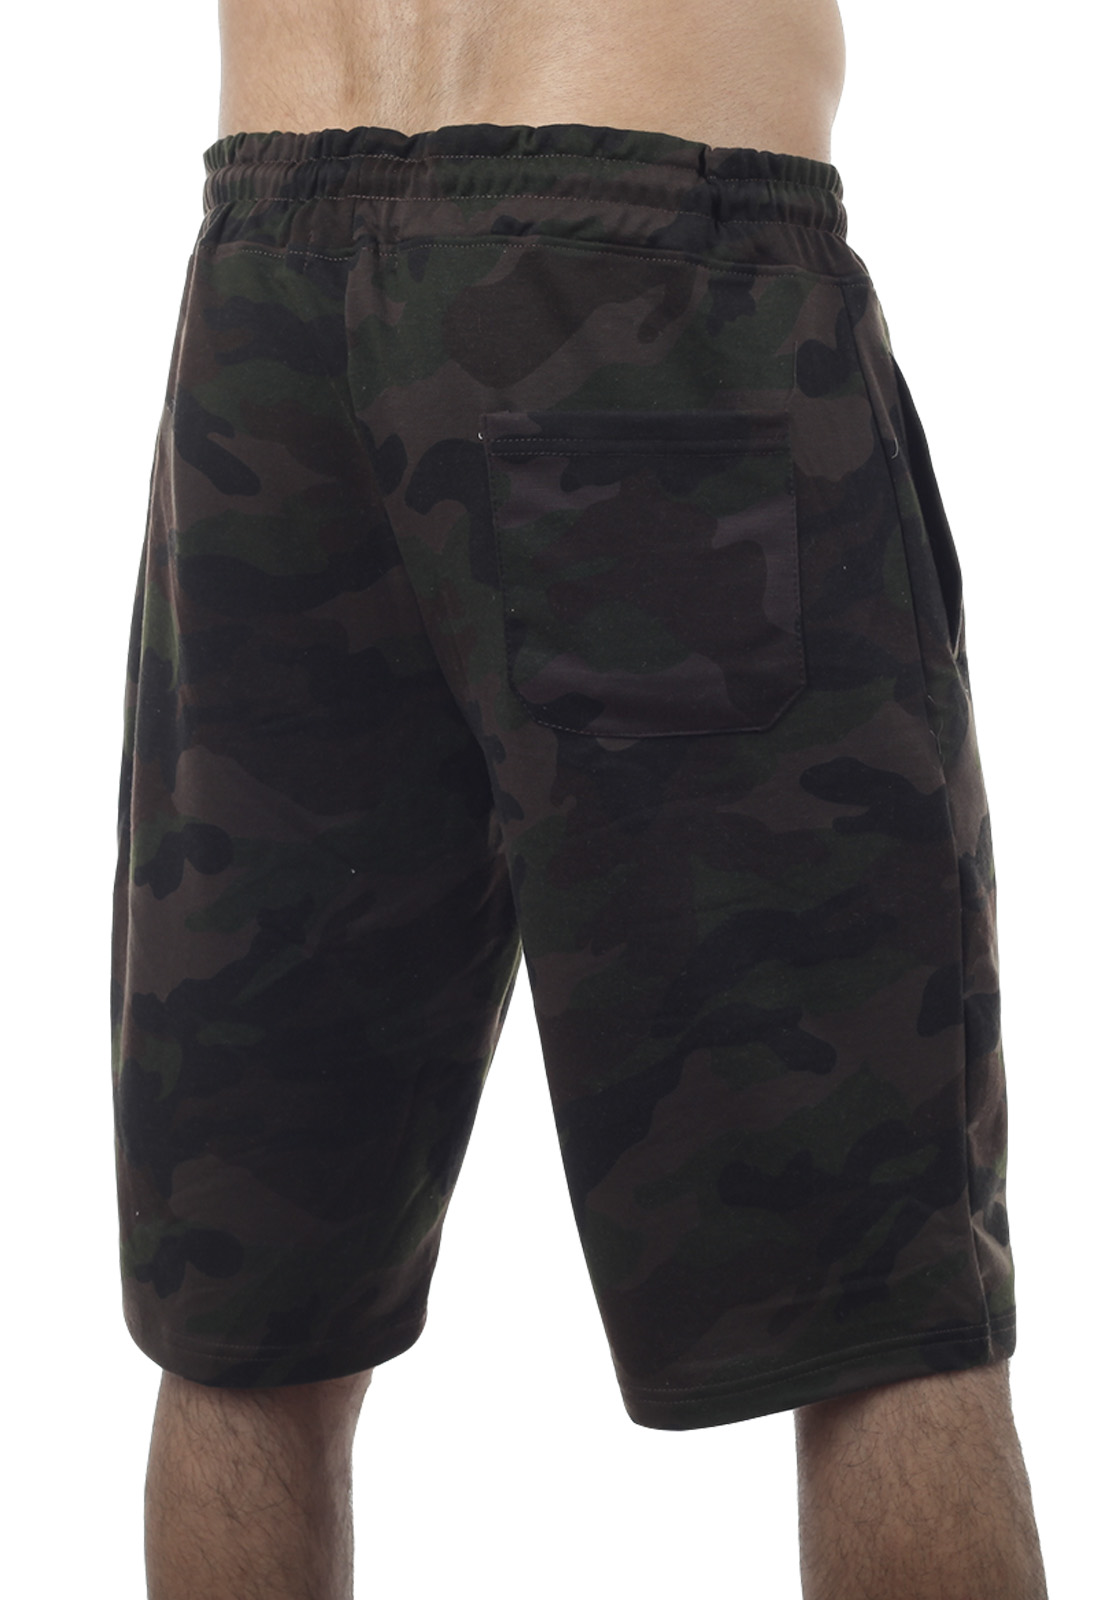 Для Commandos! Мужские армейские шорты СПЕЦНАЗ от ТМ IZZUE